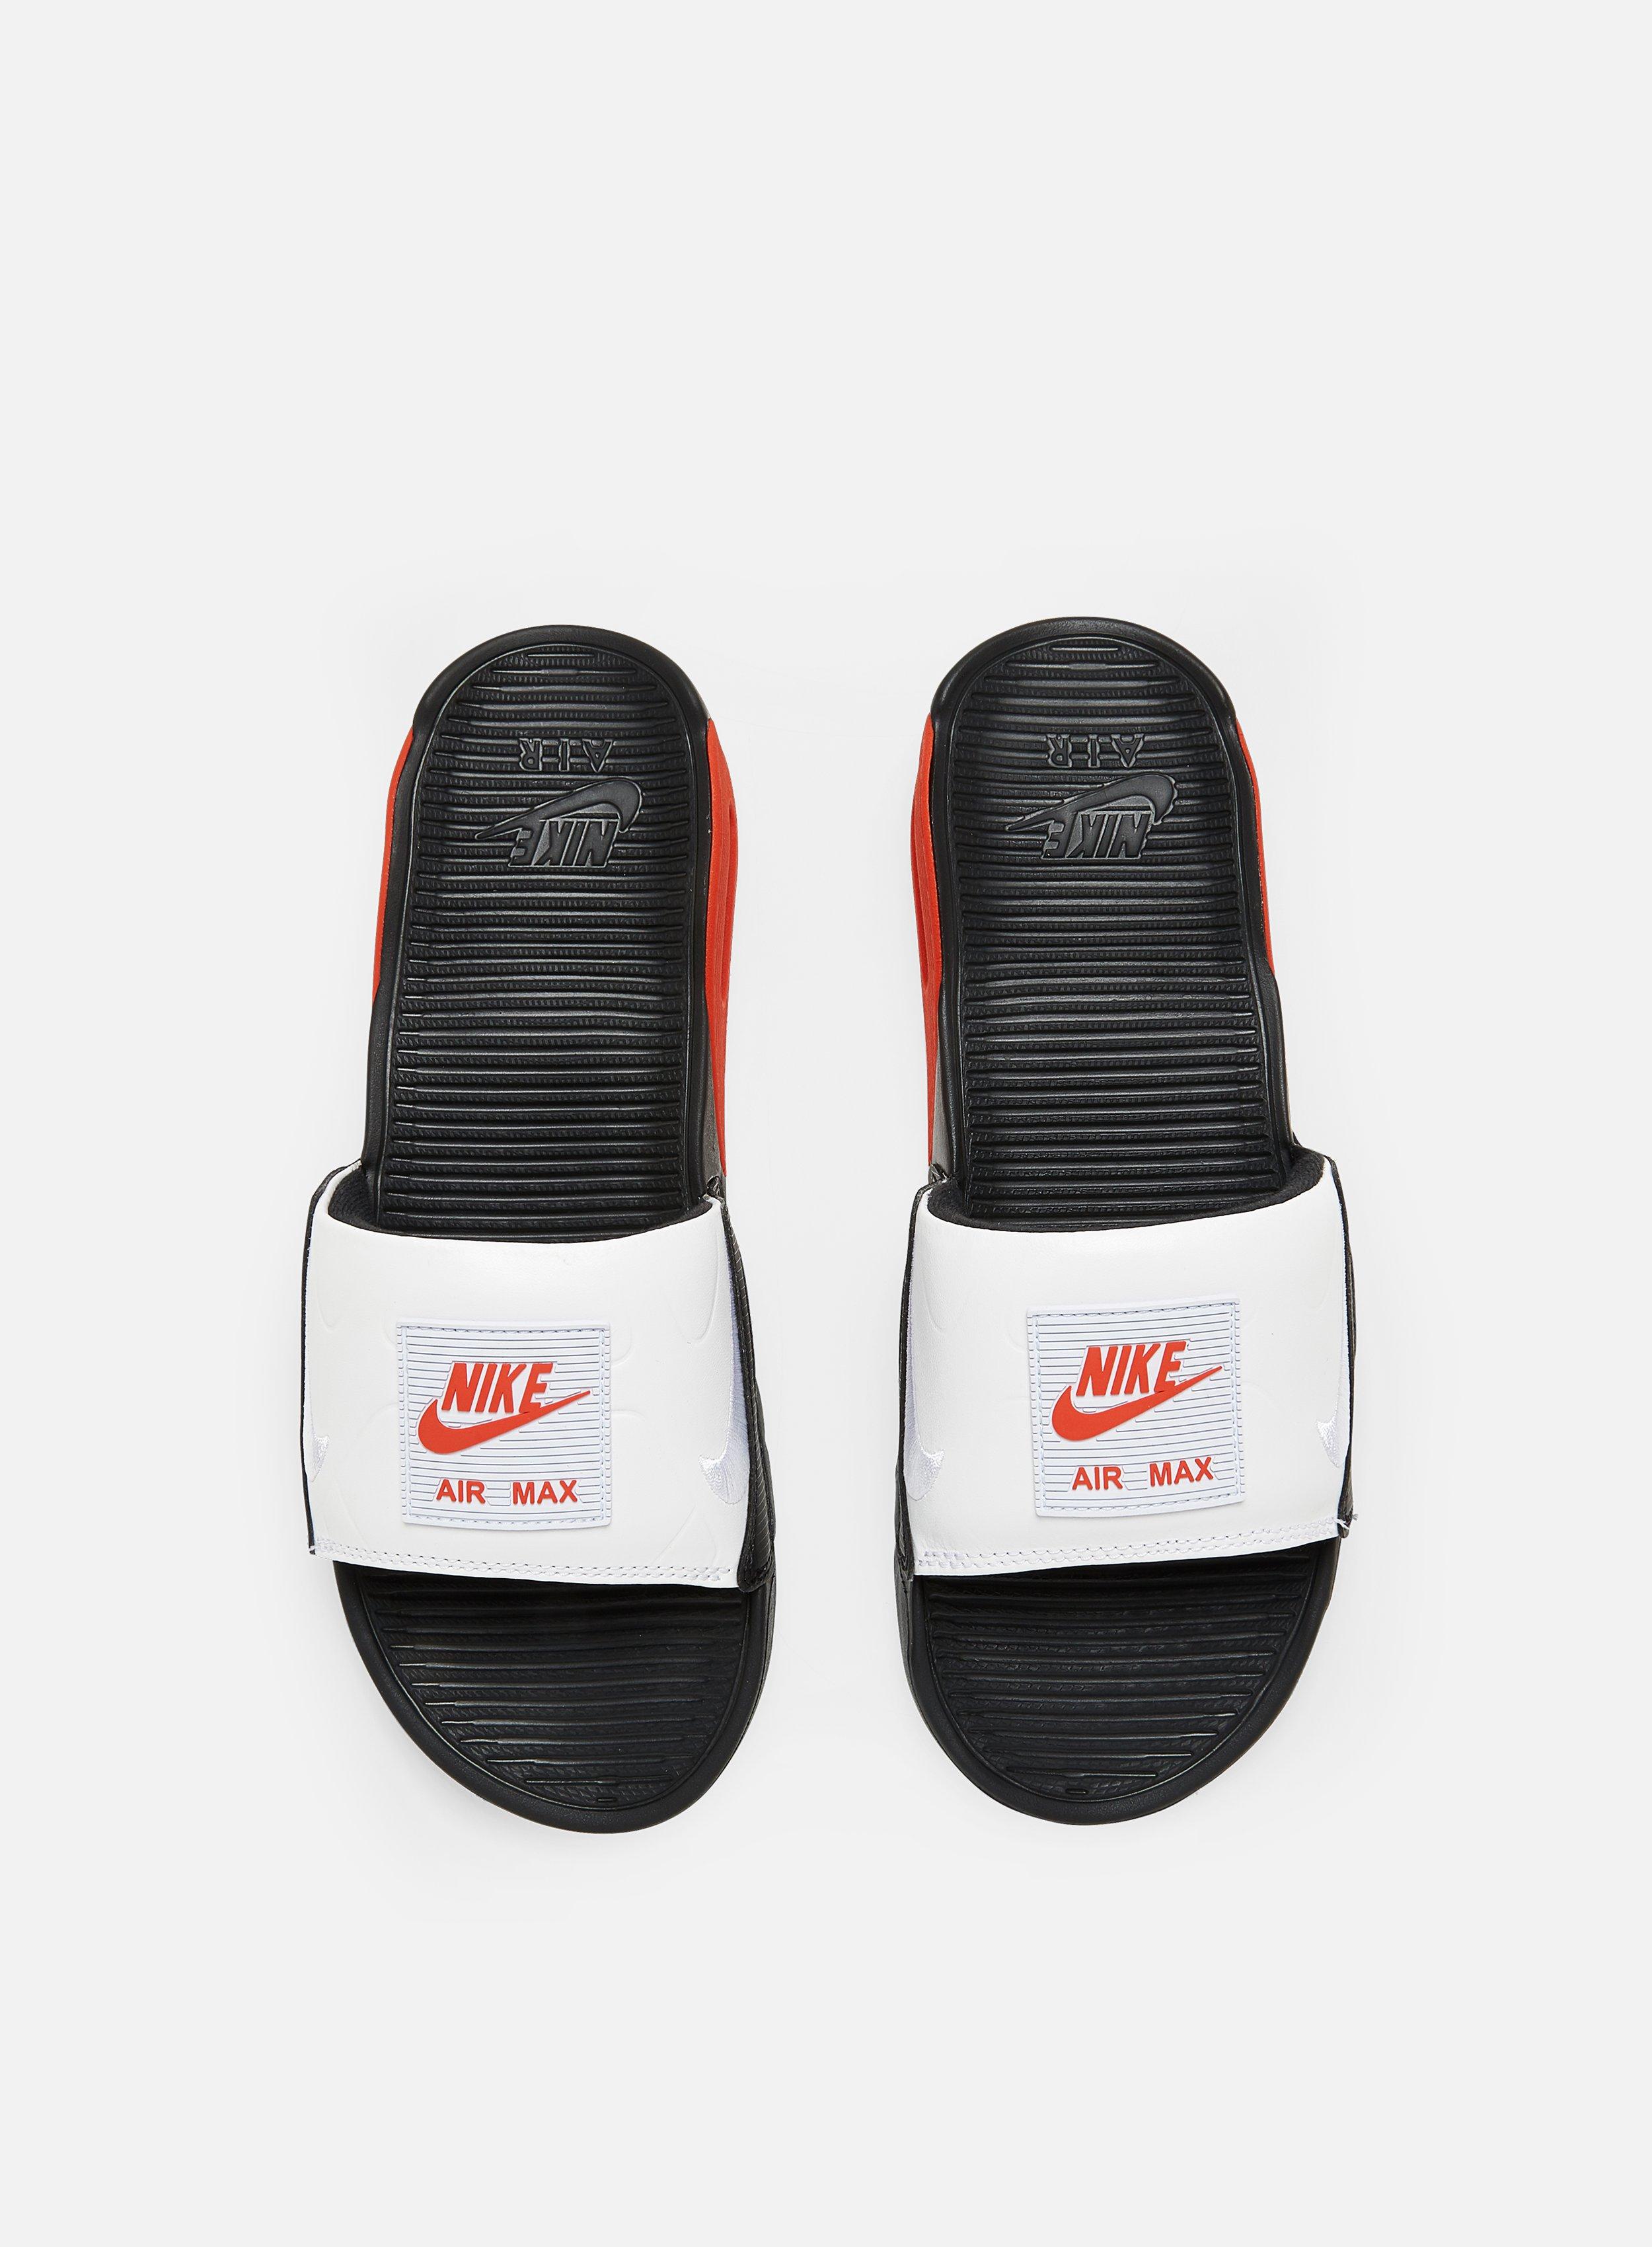 Nike Air Max 90 Slide Men, Black White Chile Red | Graffitishop